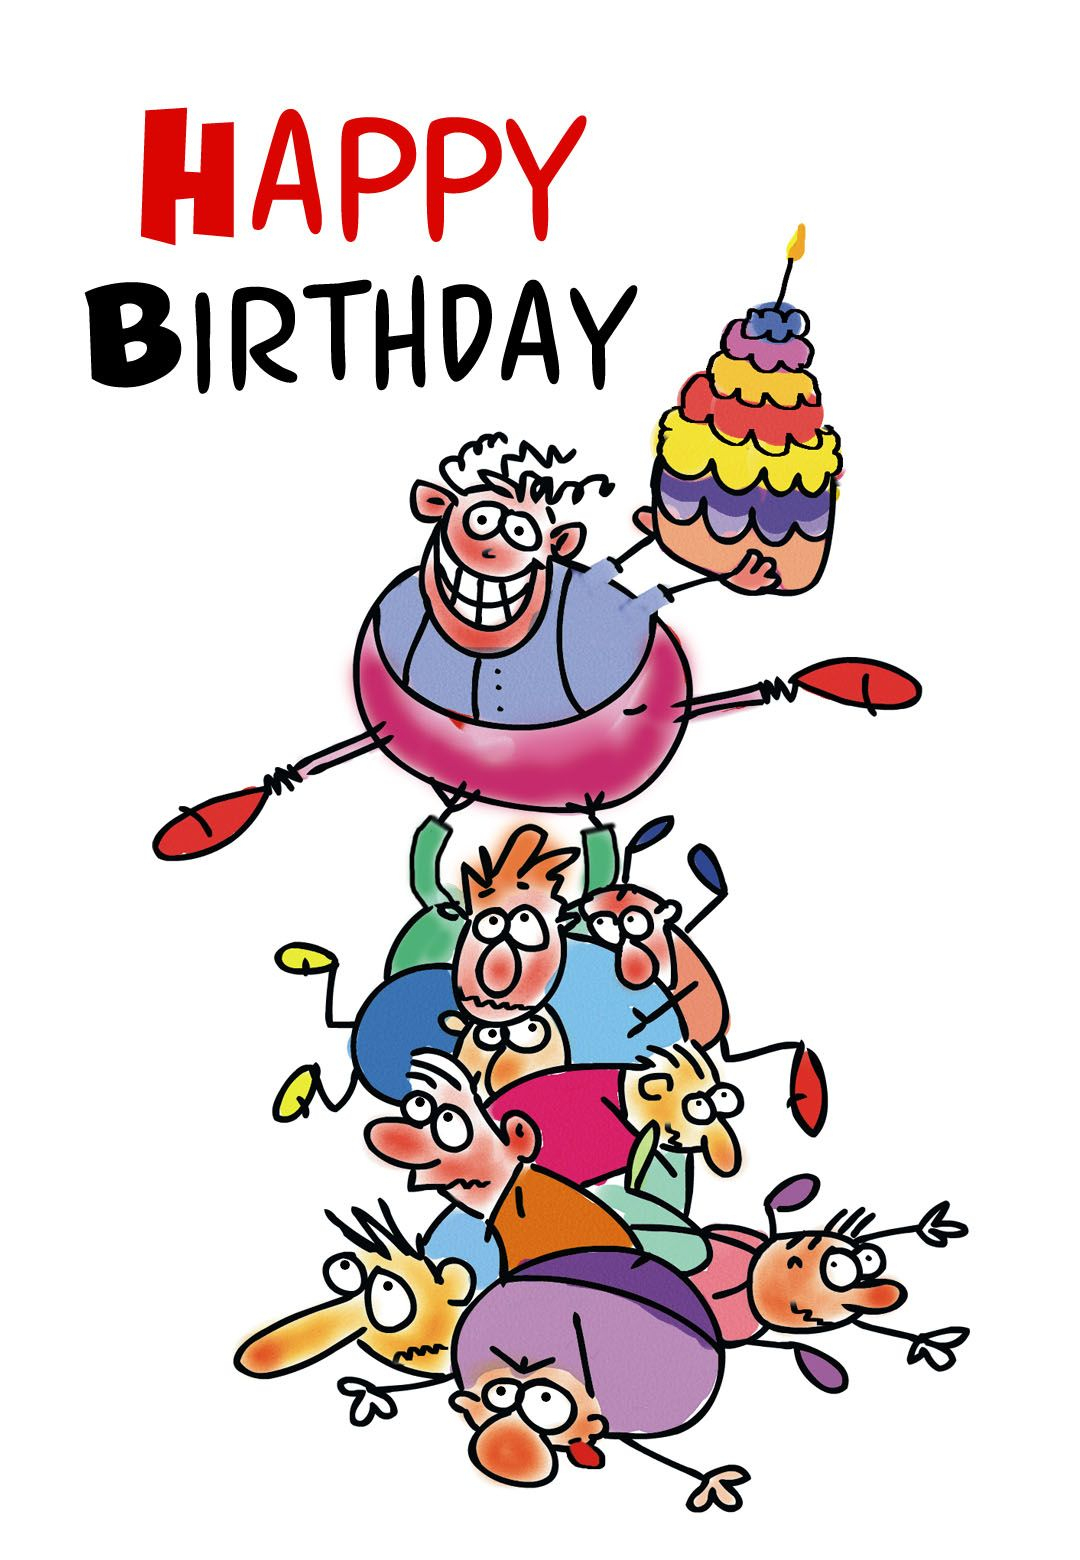 Free Printable Funny Birthday Greeting Card   Gifts To Make   Free - Free Printable 50Th Birthday Cards Funny